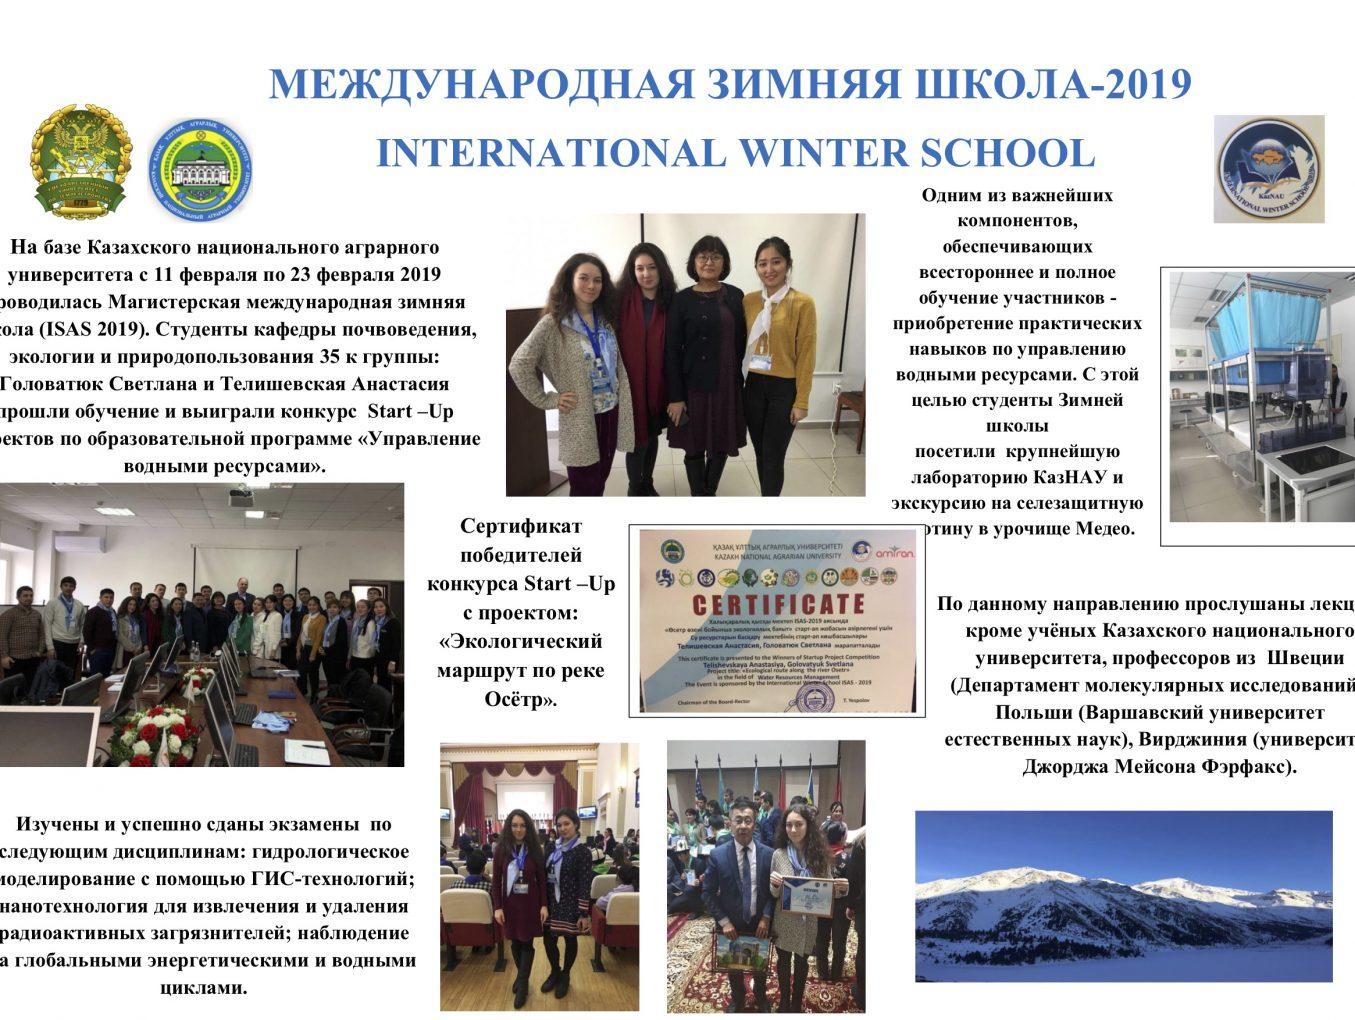 Международная зимняя школа-2019